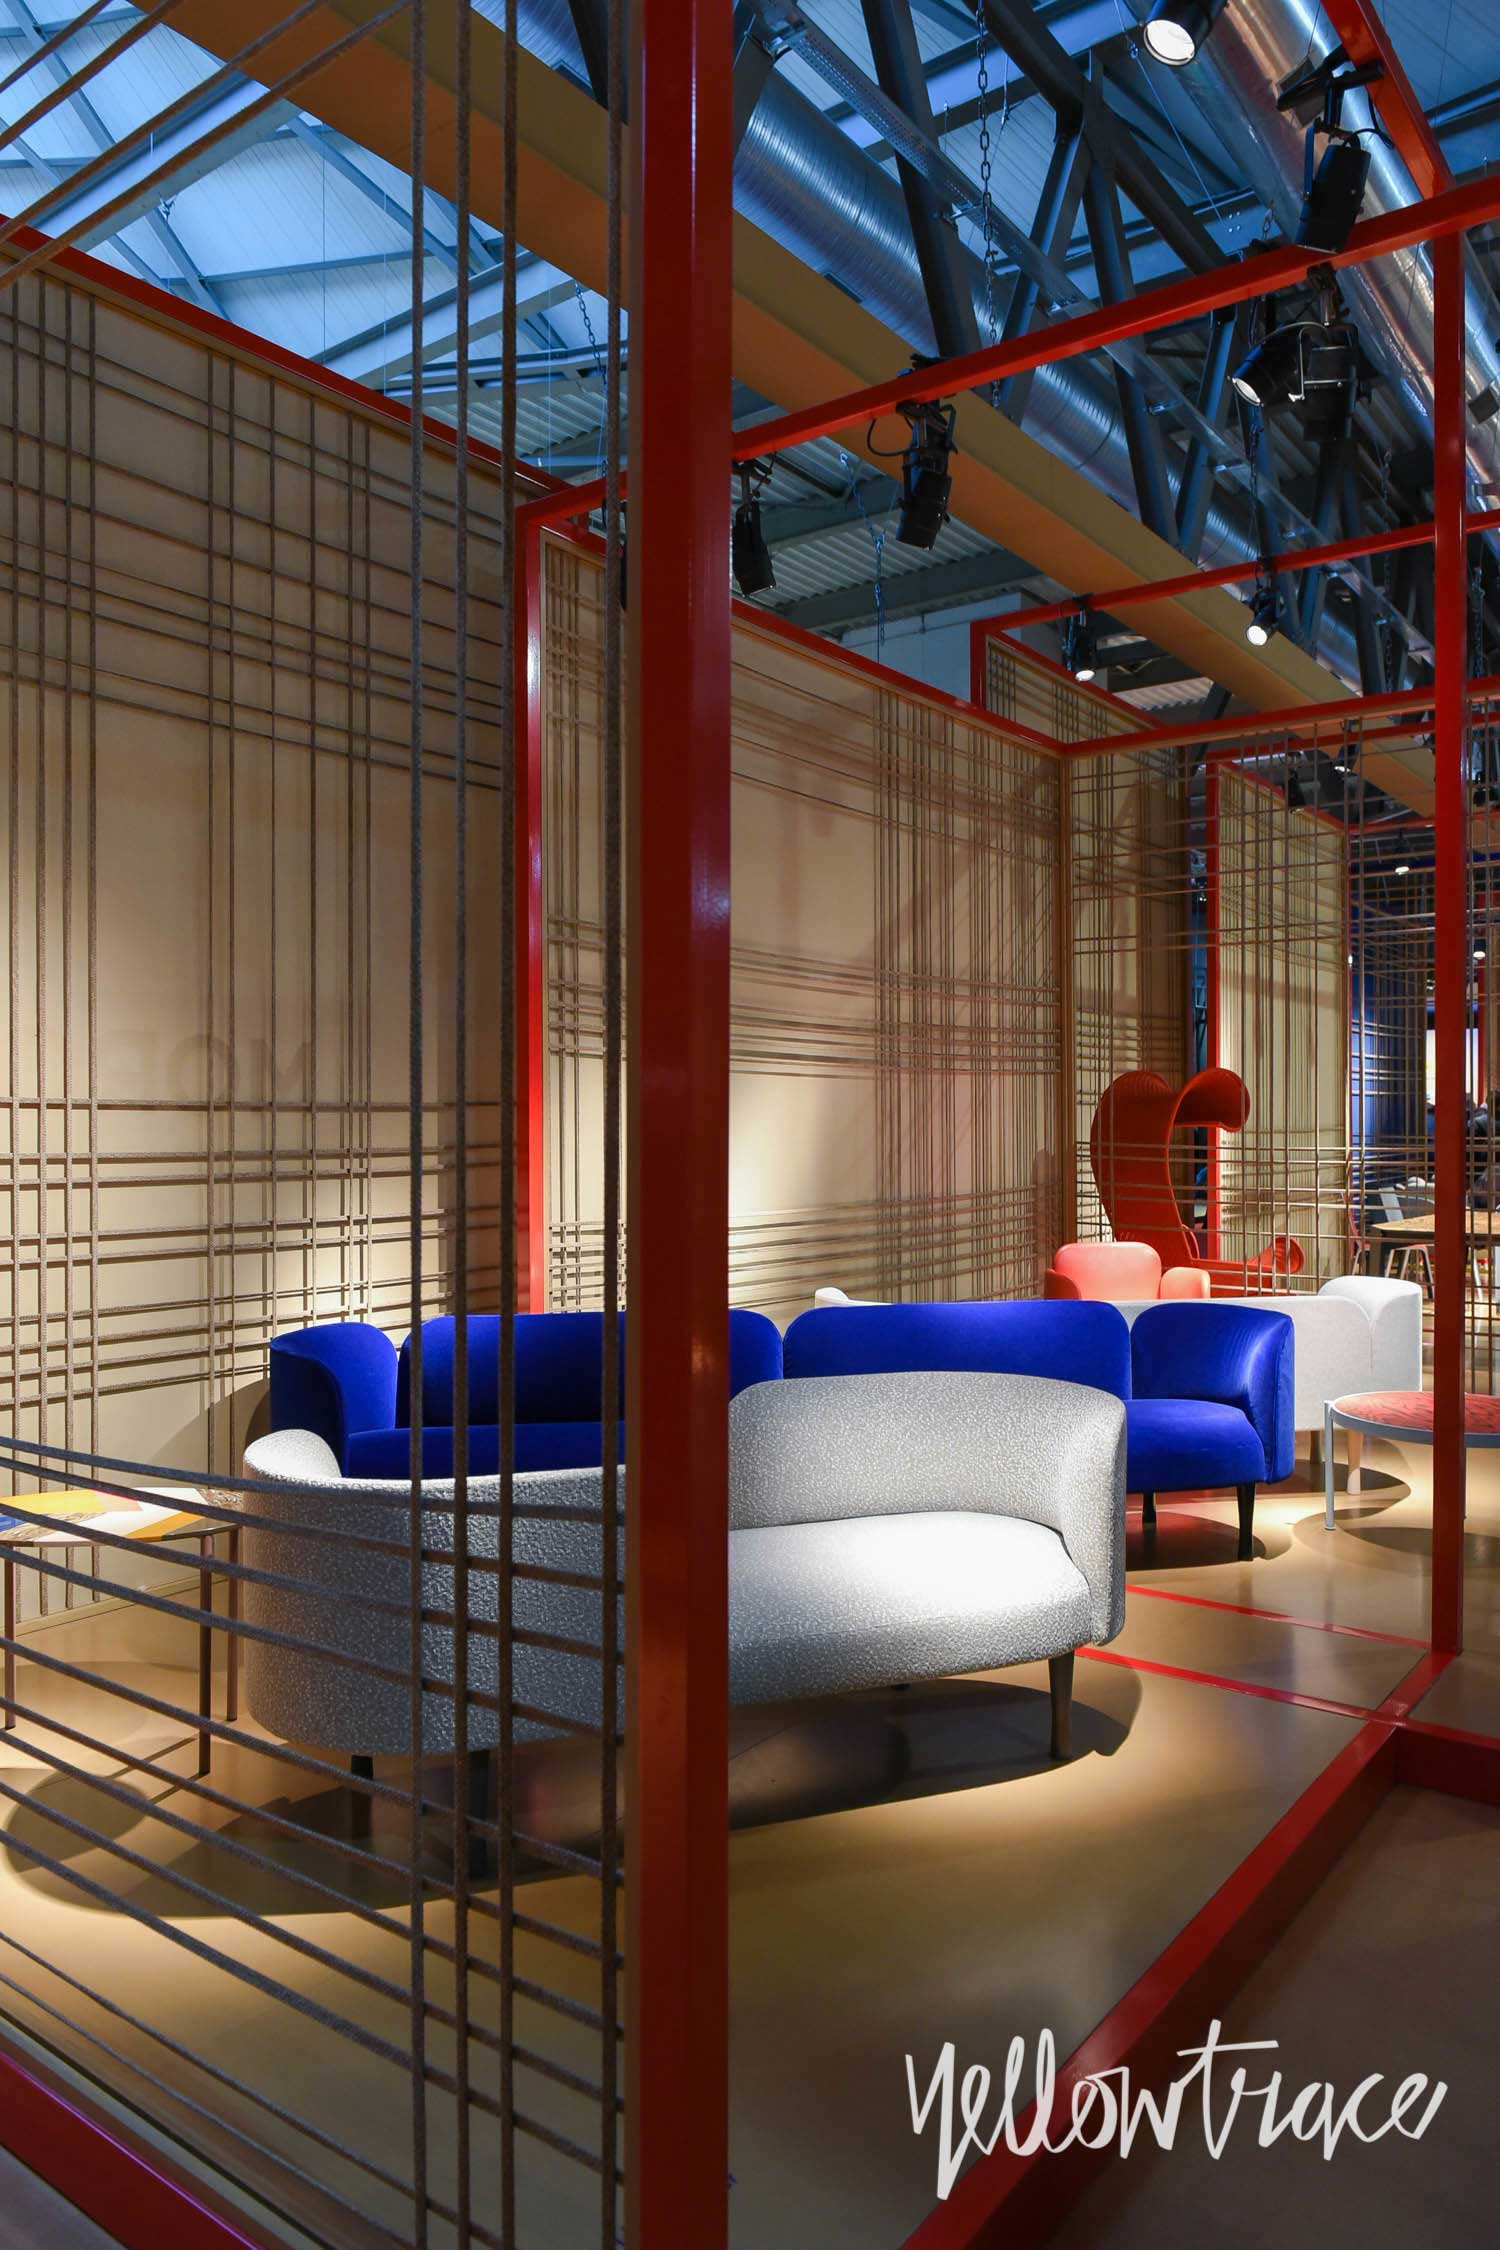 Best new furniture and stands at salone del mobile milano - Fiera del mobile vicenza ...